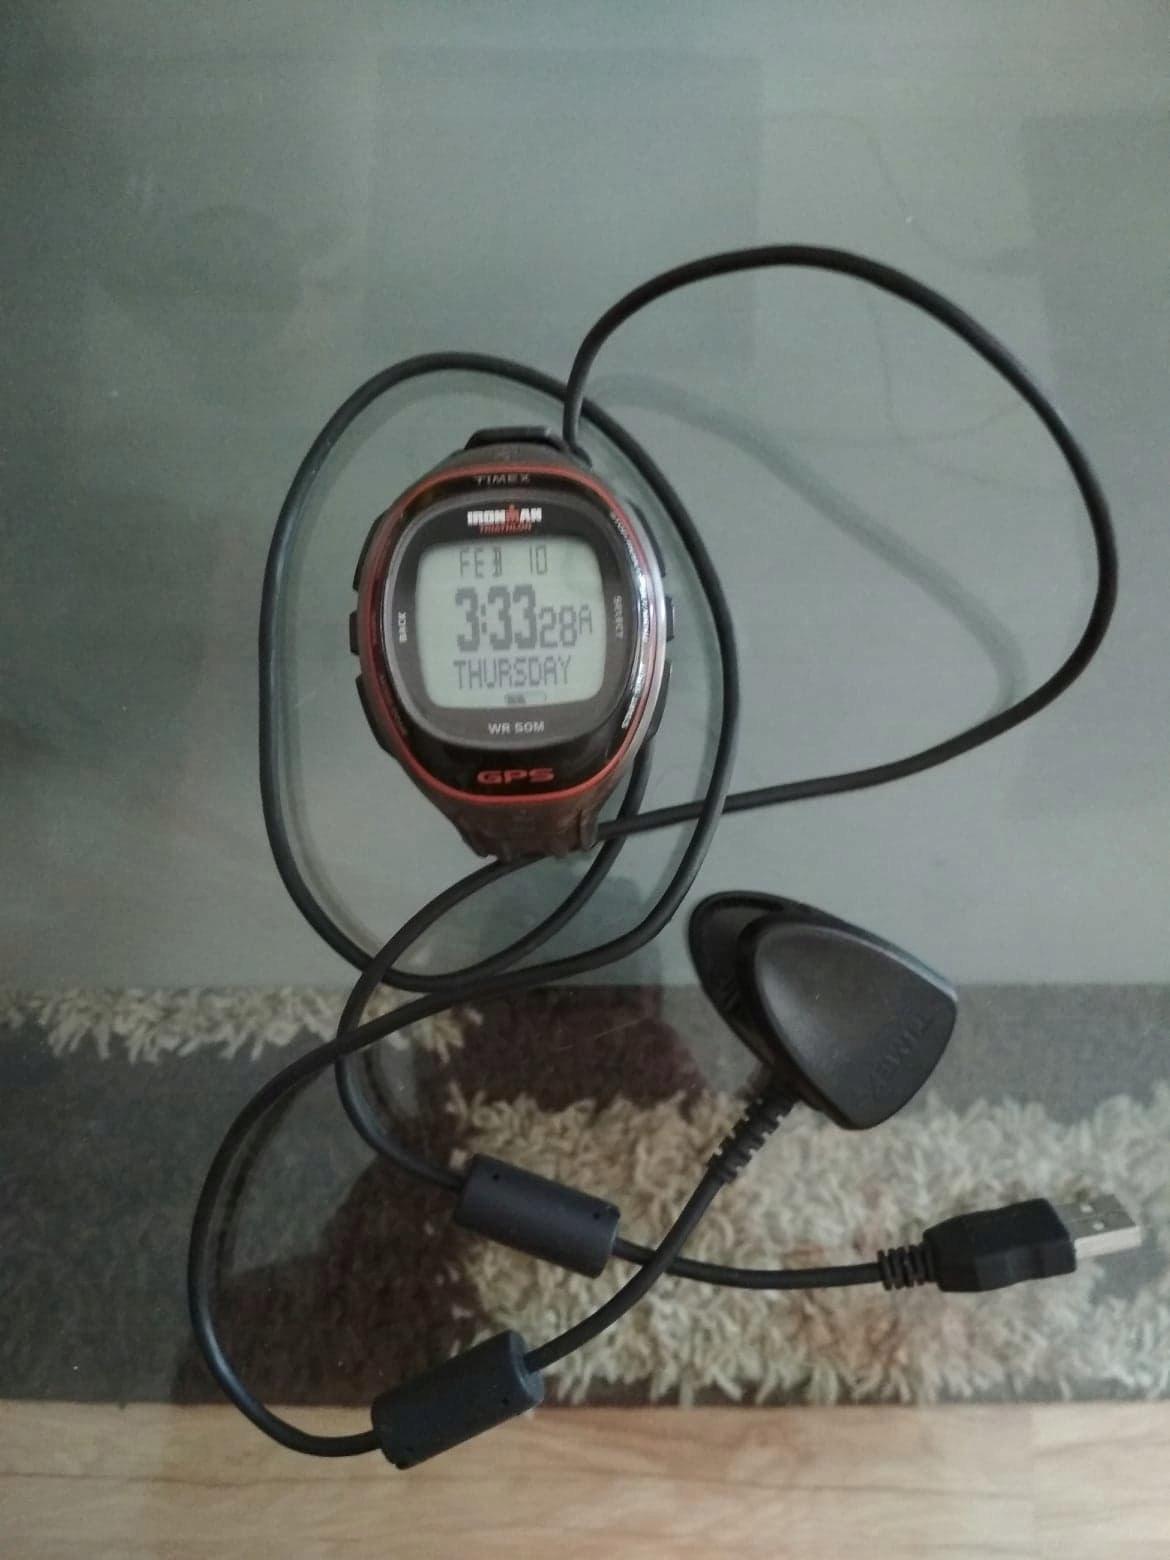 Timex Ironman Run Trainer GPS